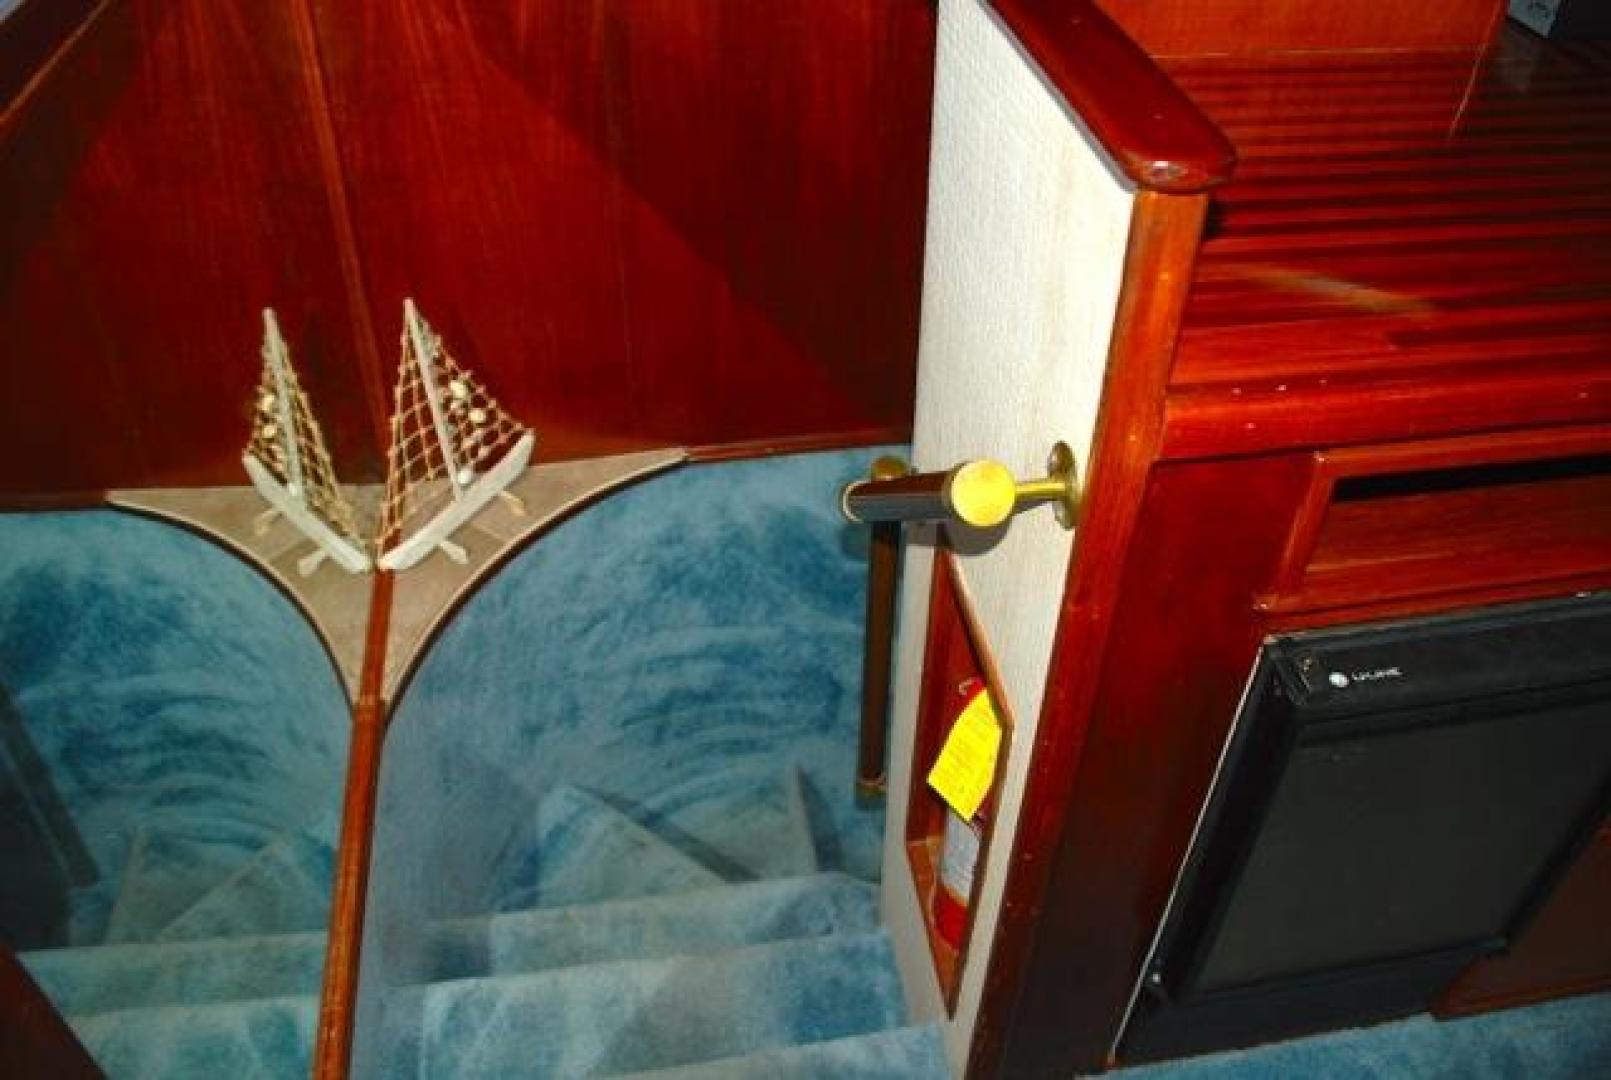 Infinity-Cockpit Motor Yacht 2001-Dont Matter Houston-Texas-United States-Stairwell-1005541 | Thumbnail